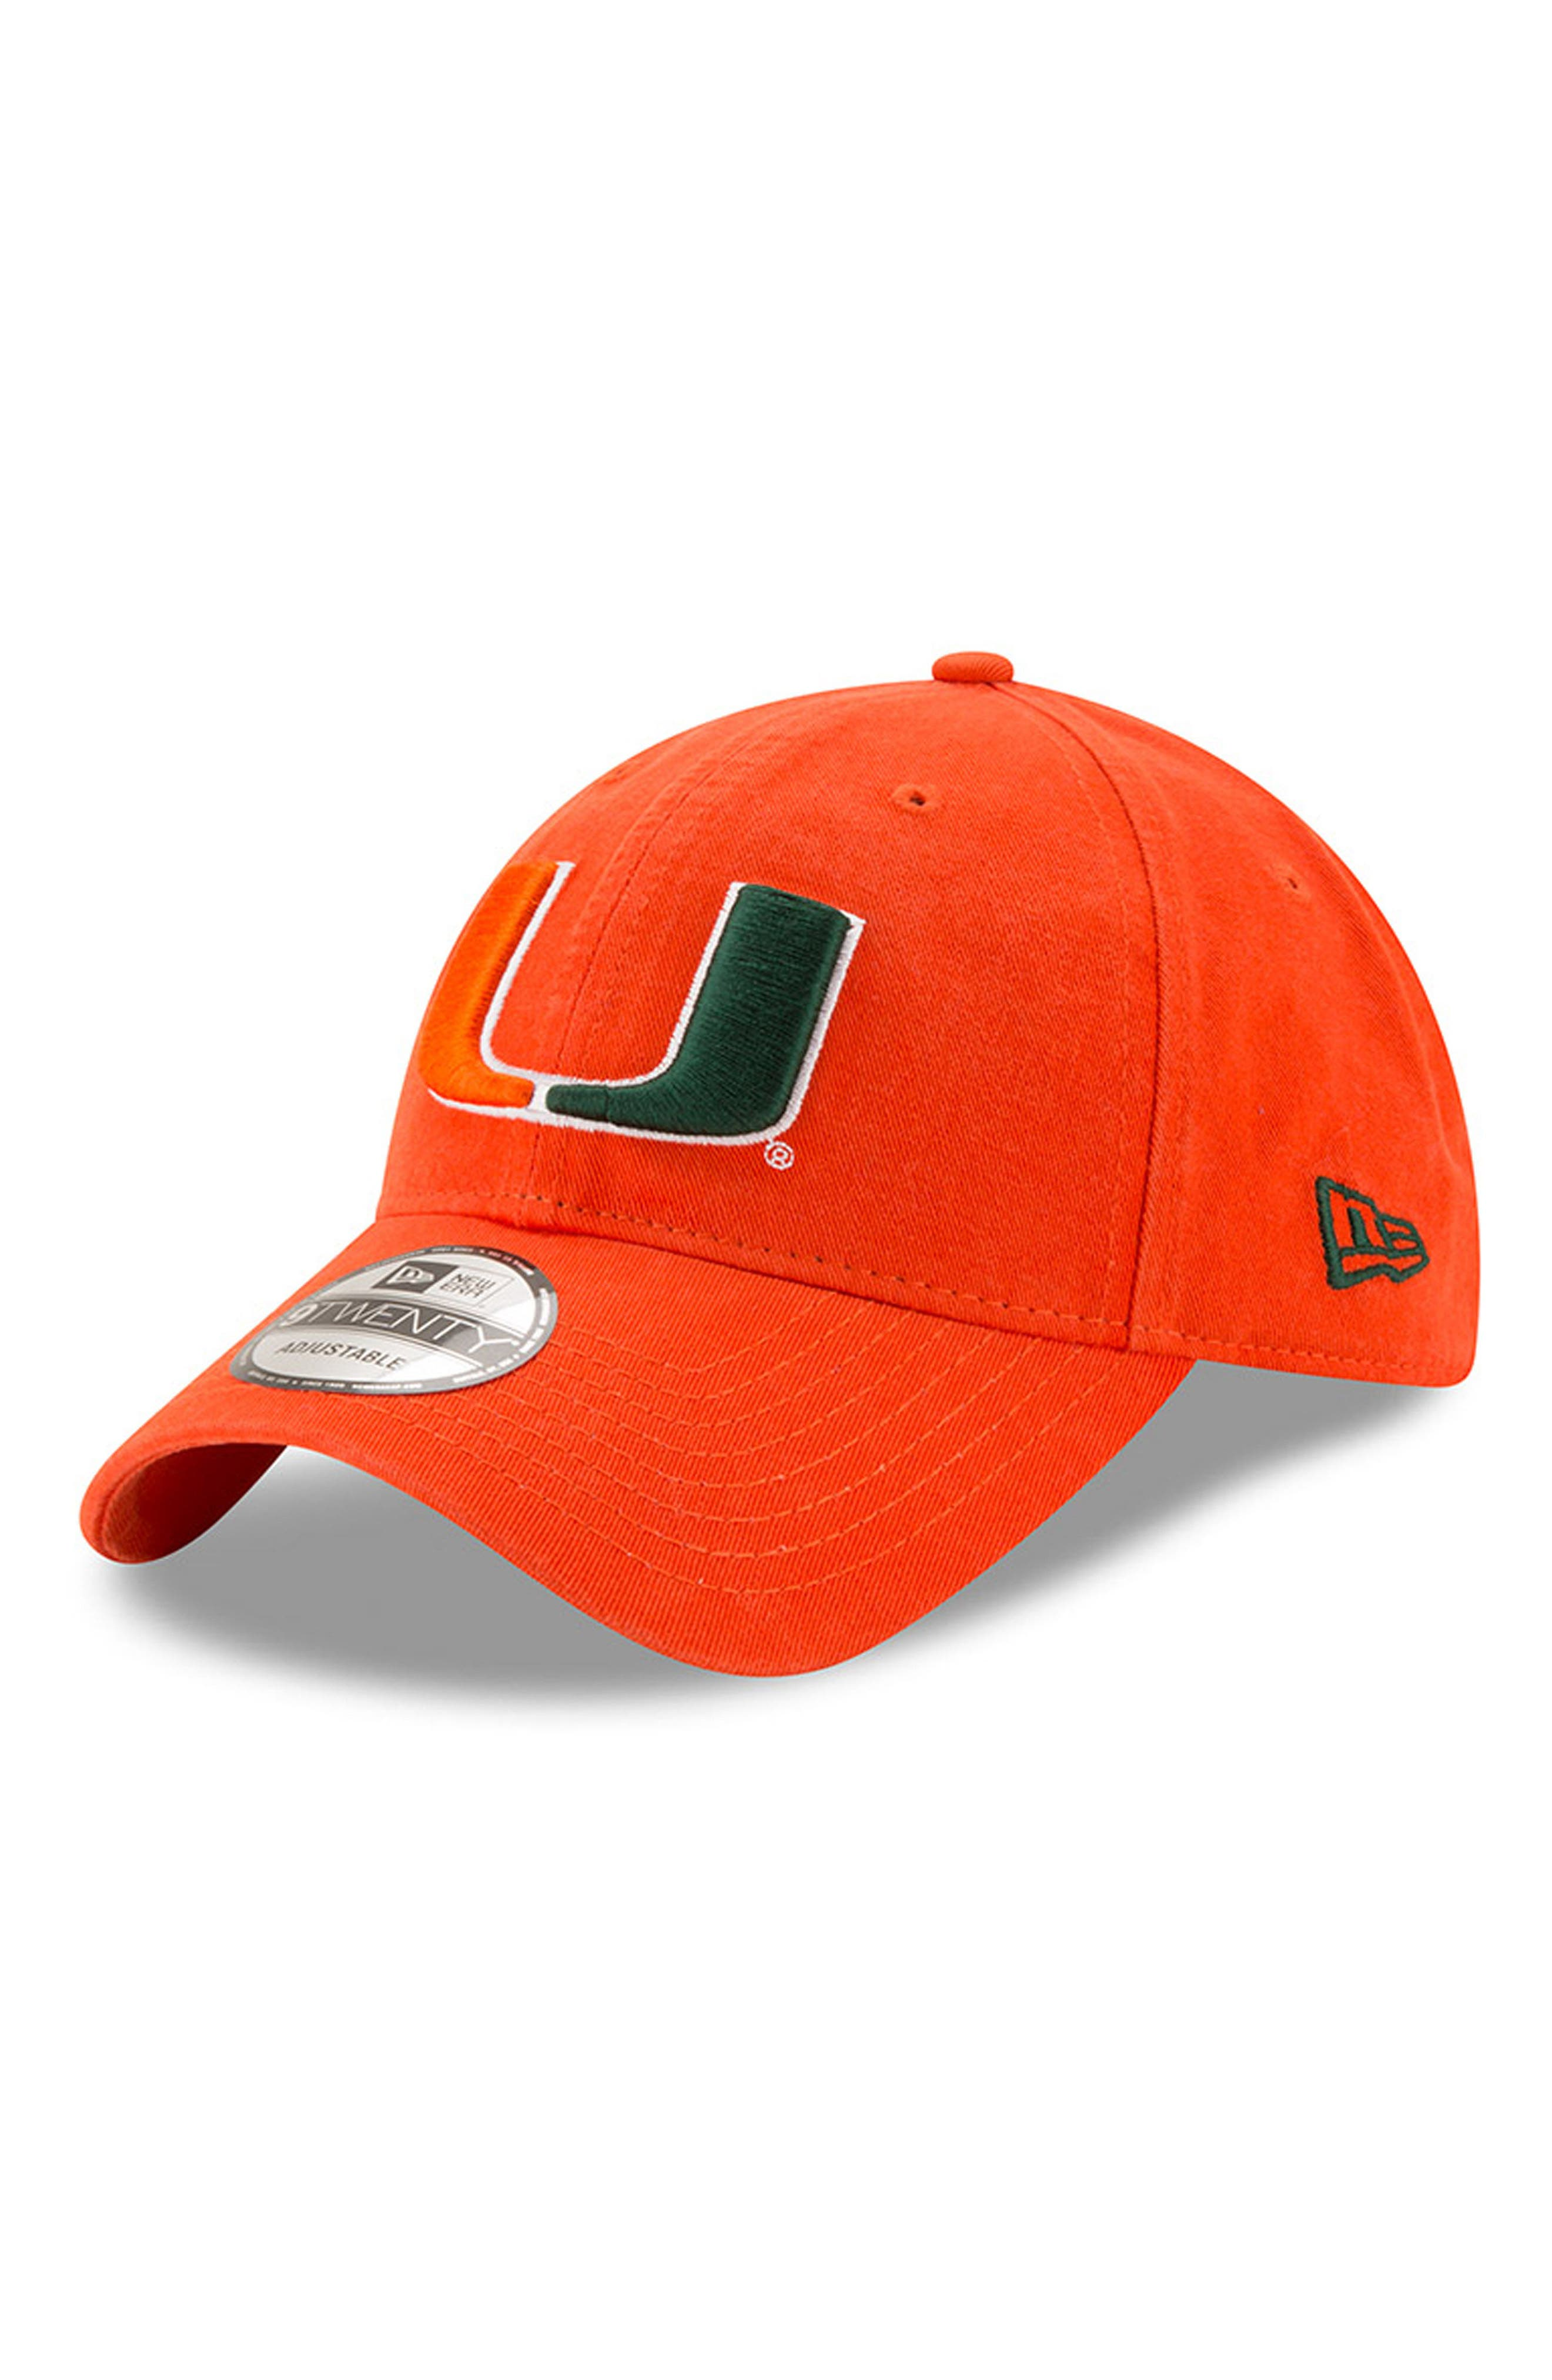 New Era Collegiate Core Classic - Miami Hurricanes Baseball Cap,                             Main thumbnail 1, color,                             Miami Hurricanes